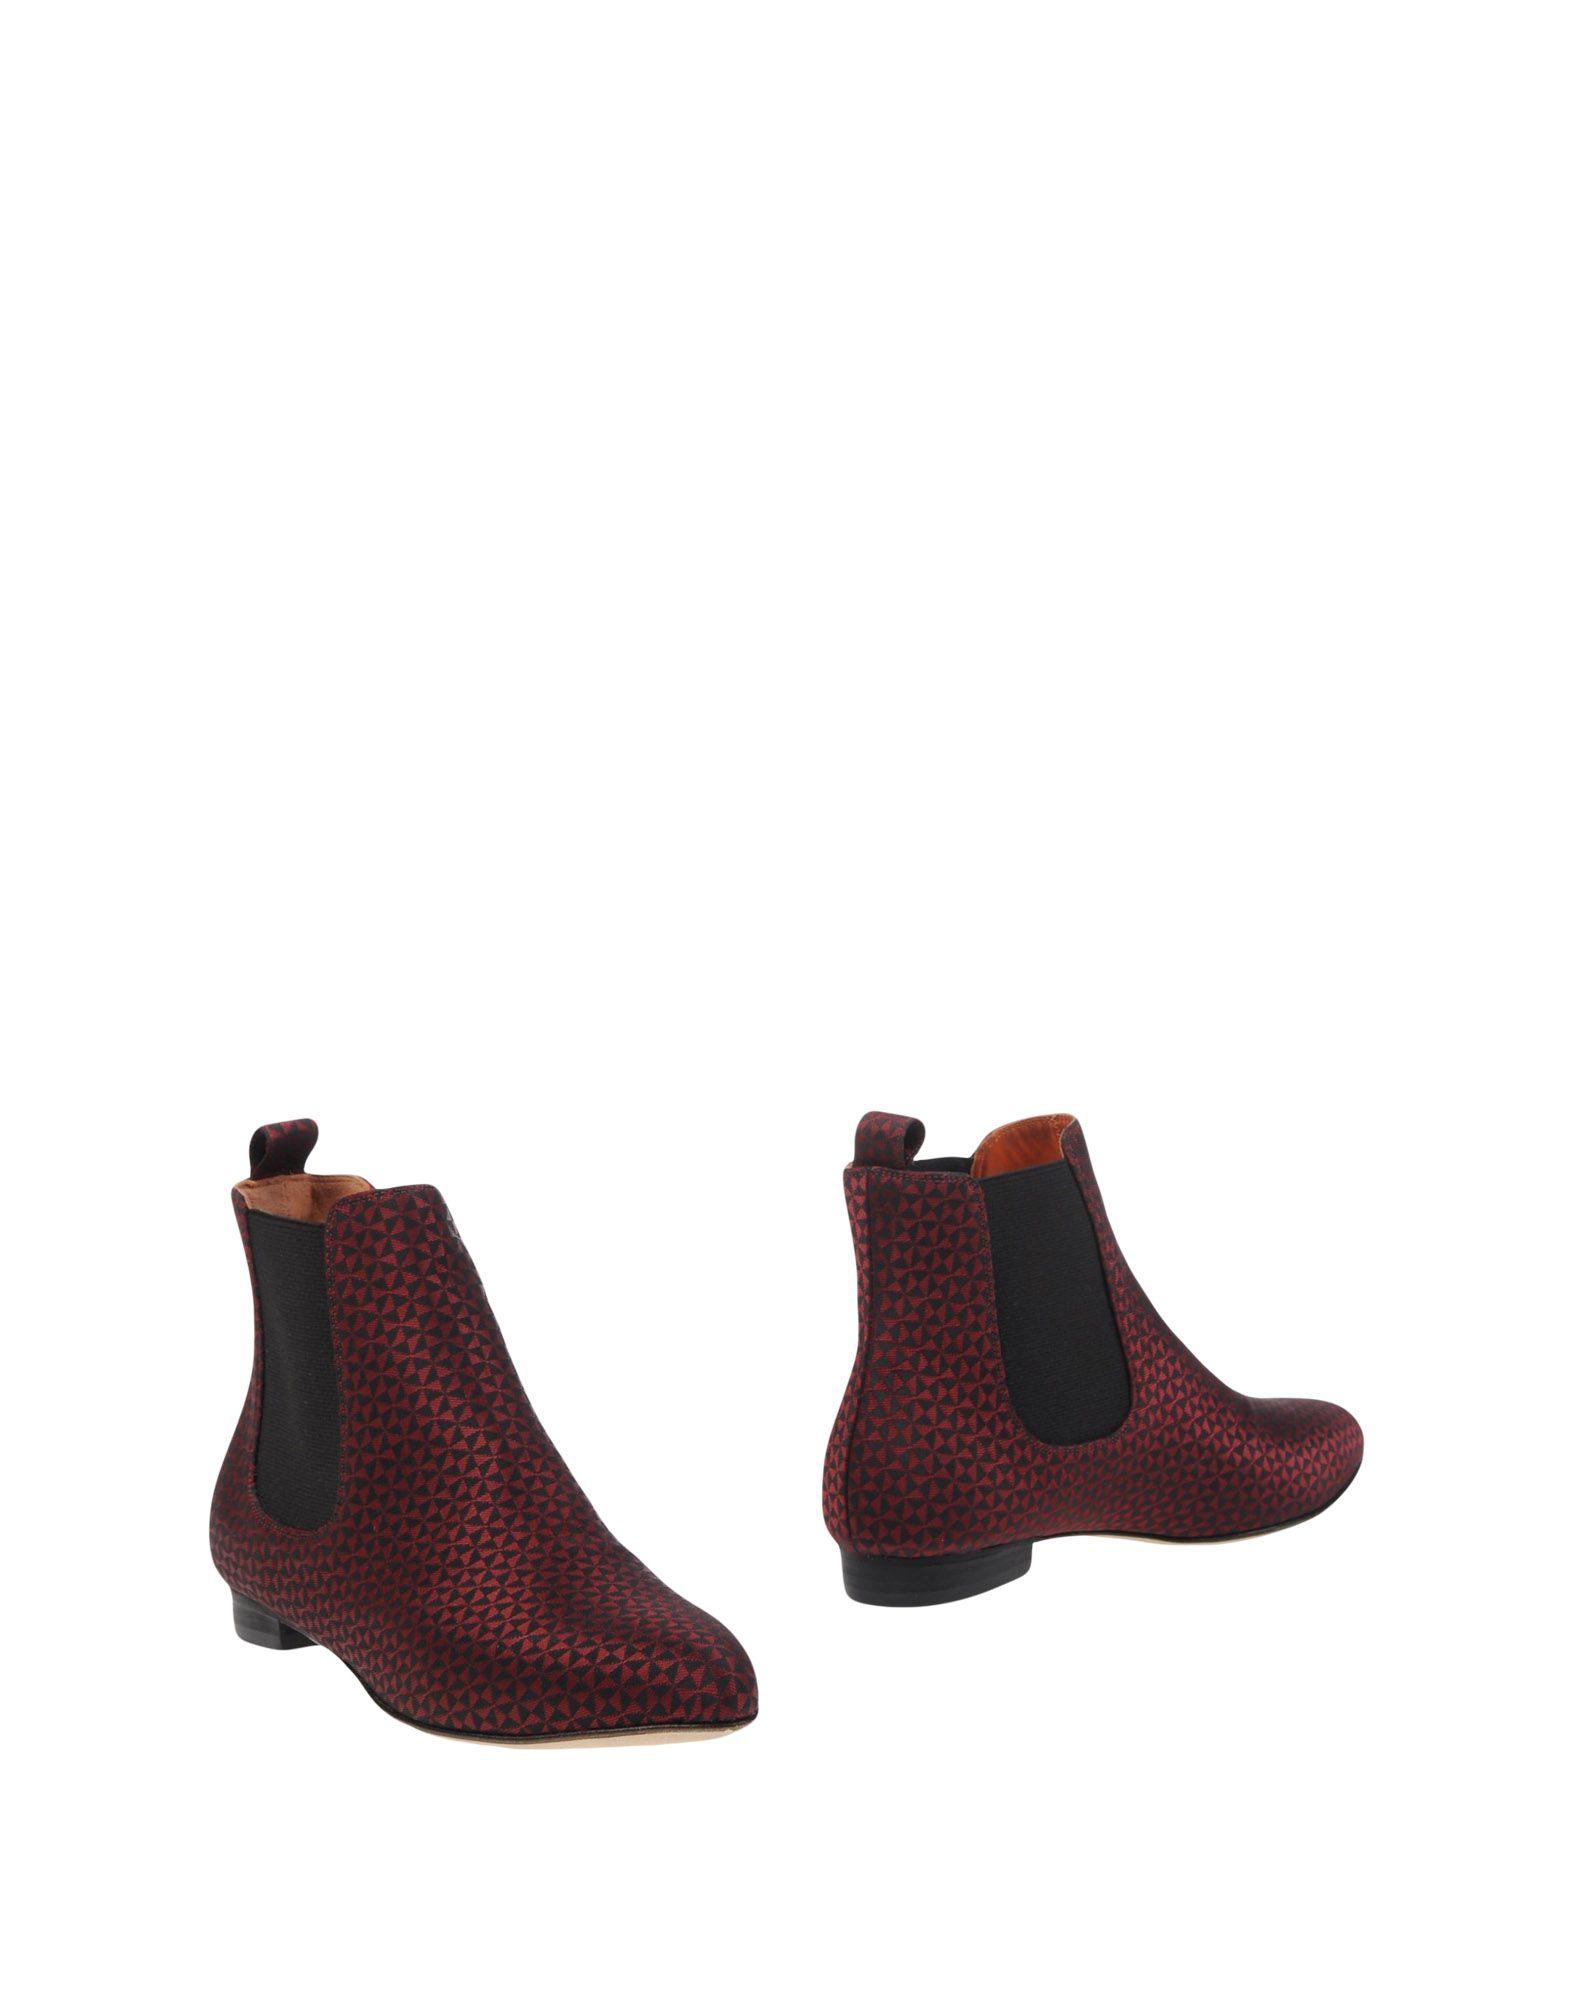 BAMS Полусапоги и высокие ботинки magazzini del sale полусапоги и высокие ботинки